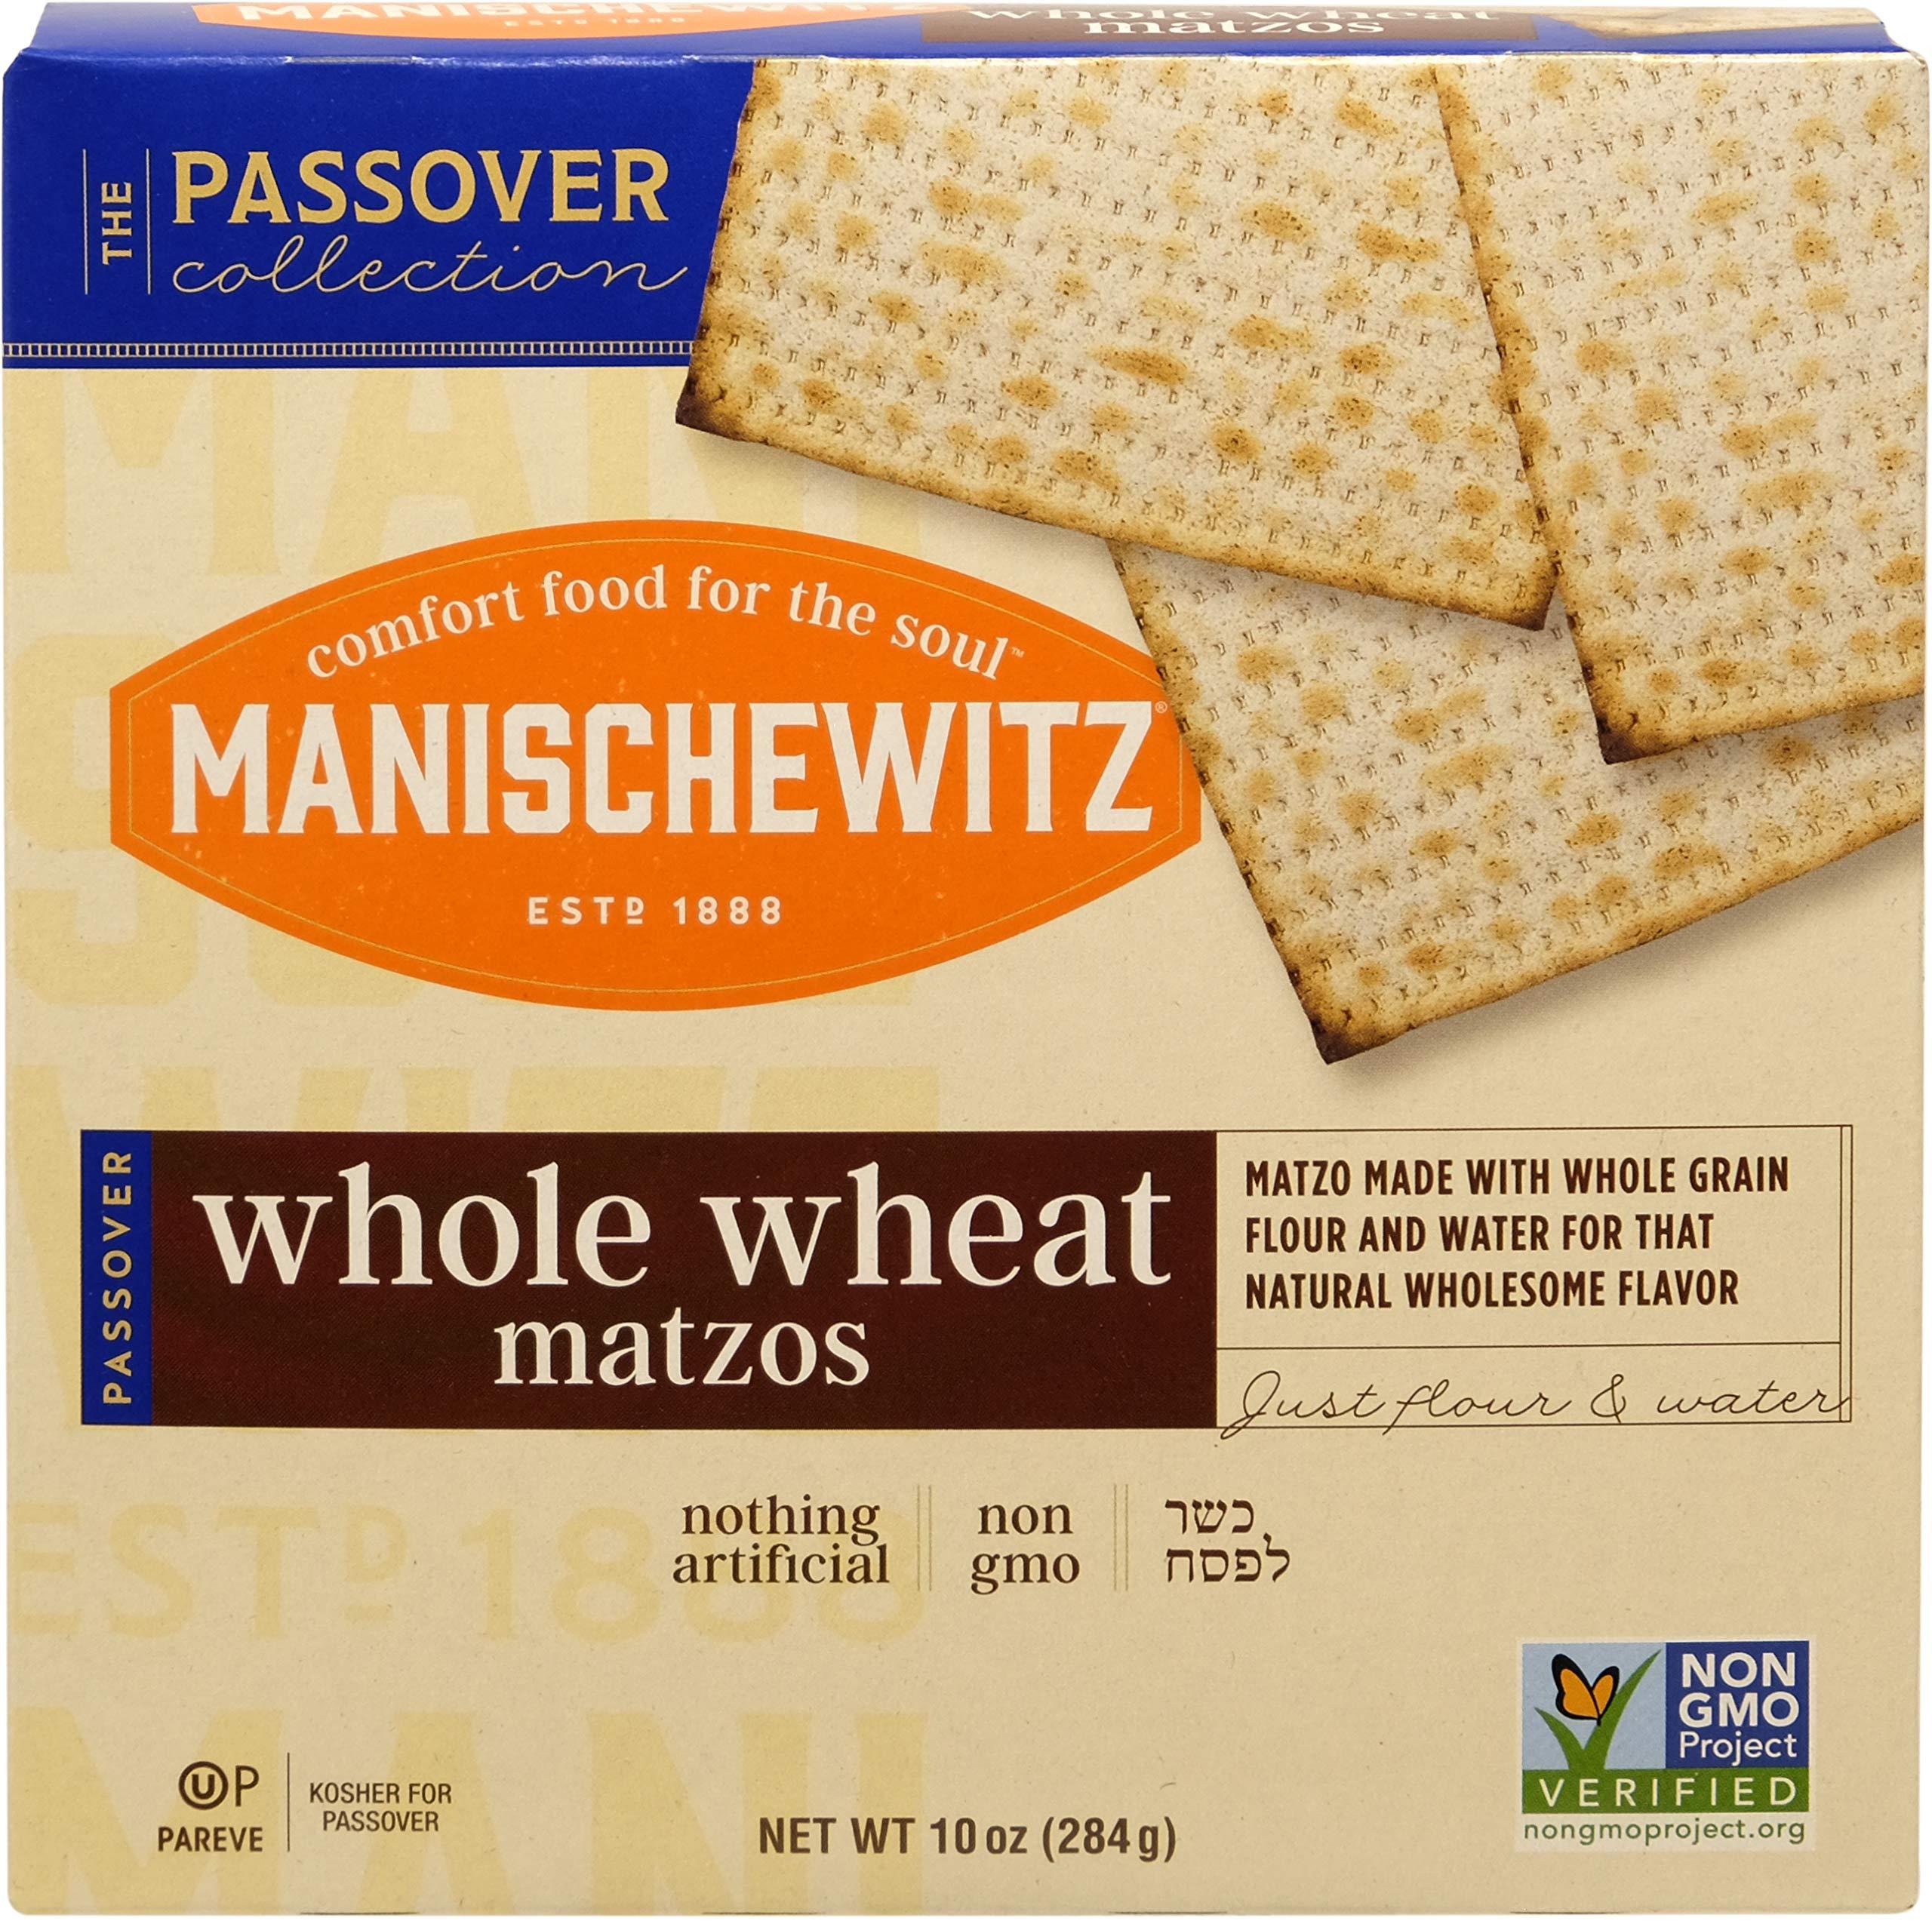 Manischewitz Whole Wheat Matzo, Kosher For Passover, 10 Ounce Box